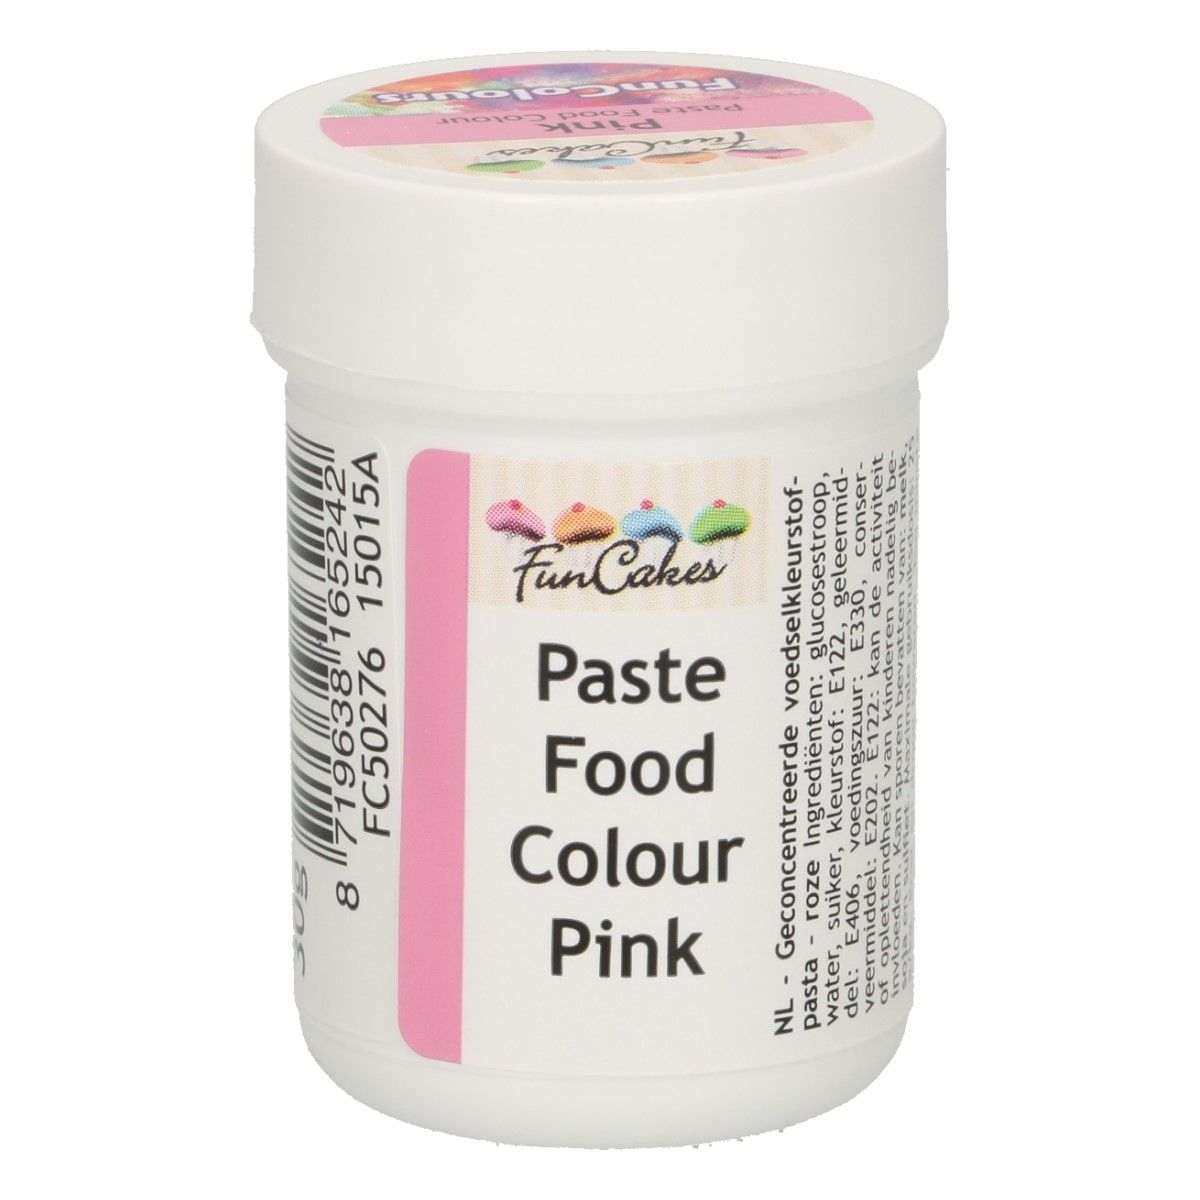 /f/u/funcakes_funcolours_paste_food_colour_pink.jpg